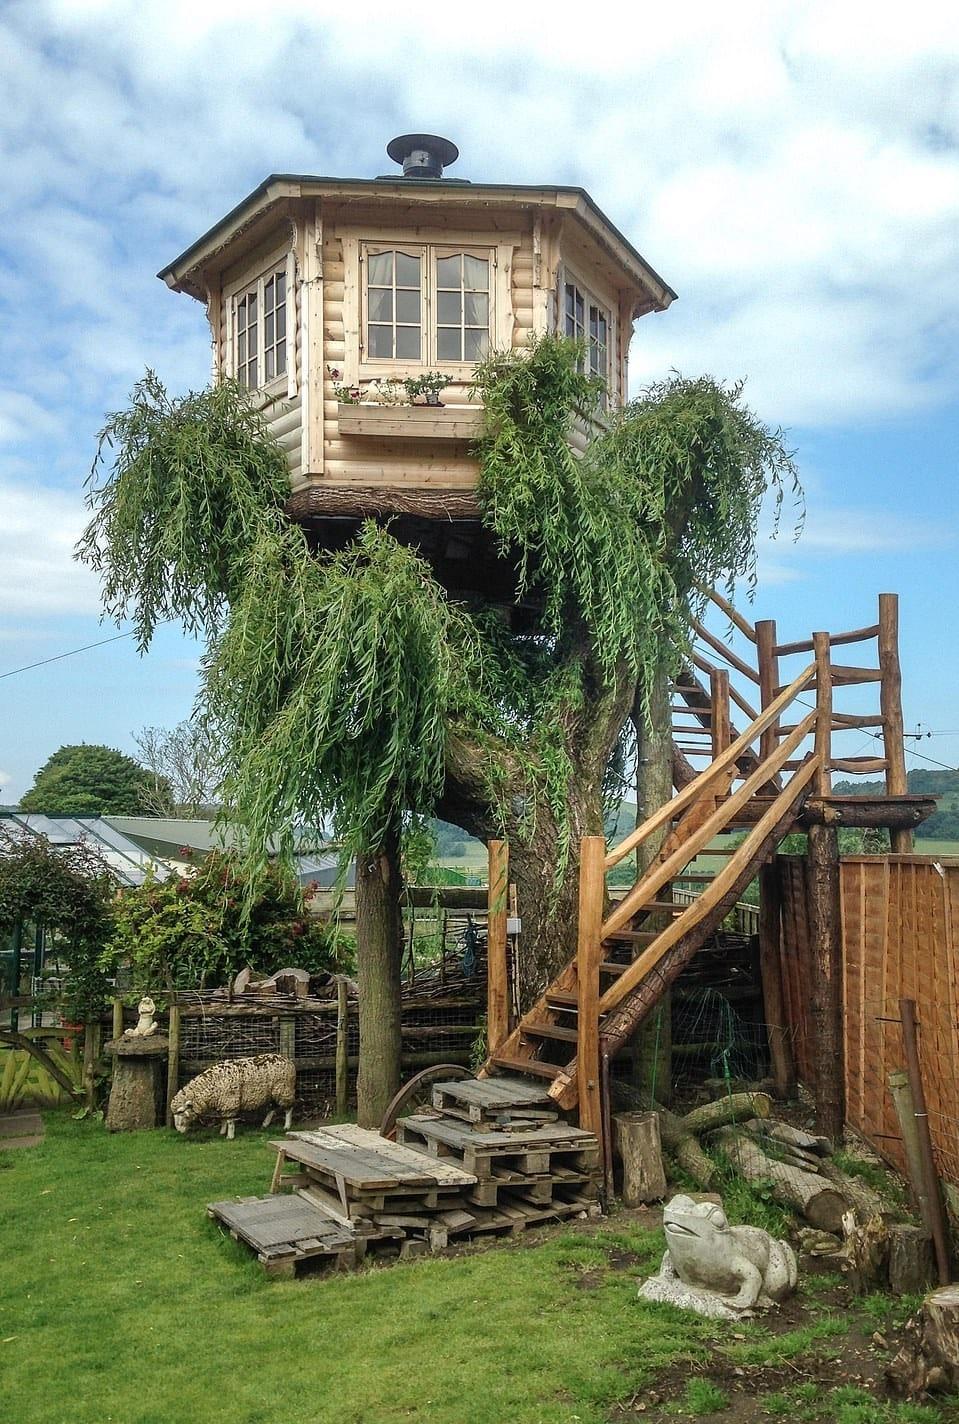 15764862 7223977 the tree house was built upon a willow tree that terry had inten a 30 1562578227654 1 - Британец хотел спилить дерево, но вид оттуда оказался так хорош, что он построил на нём домик